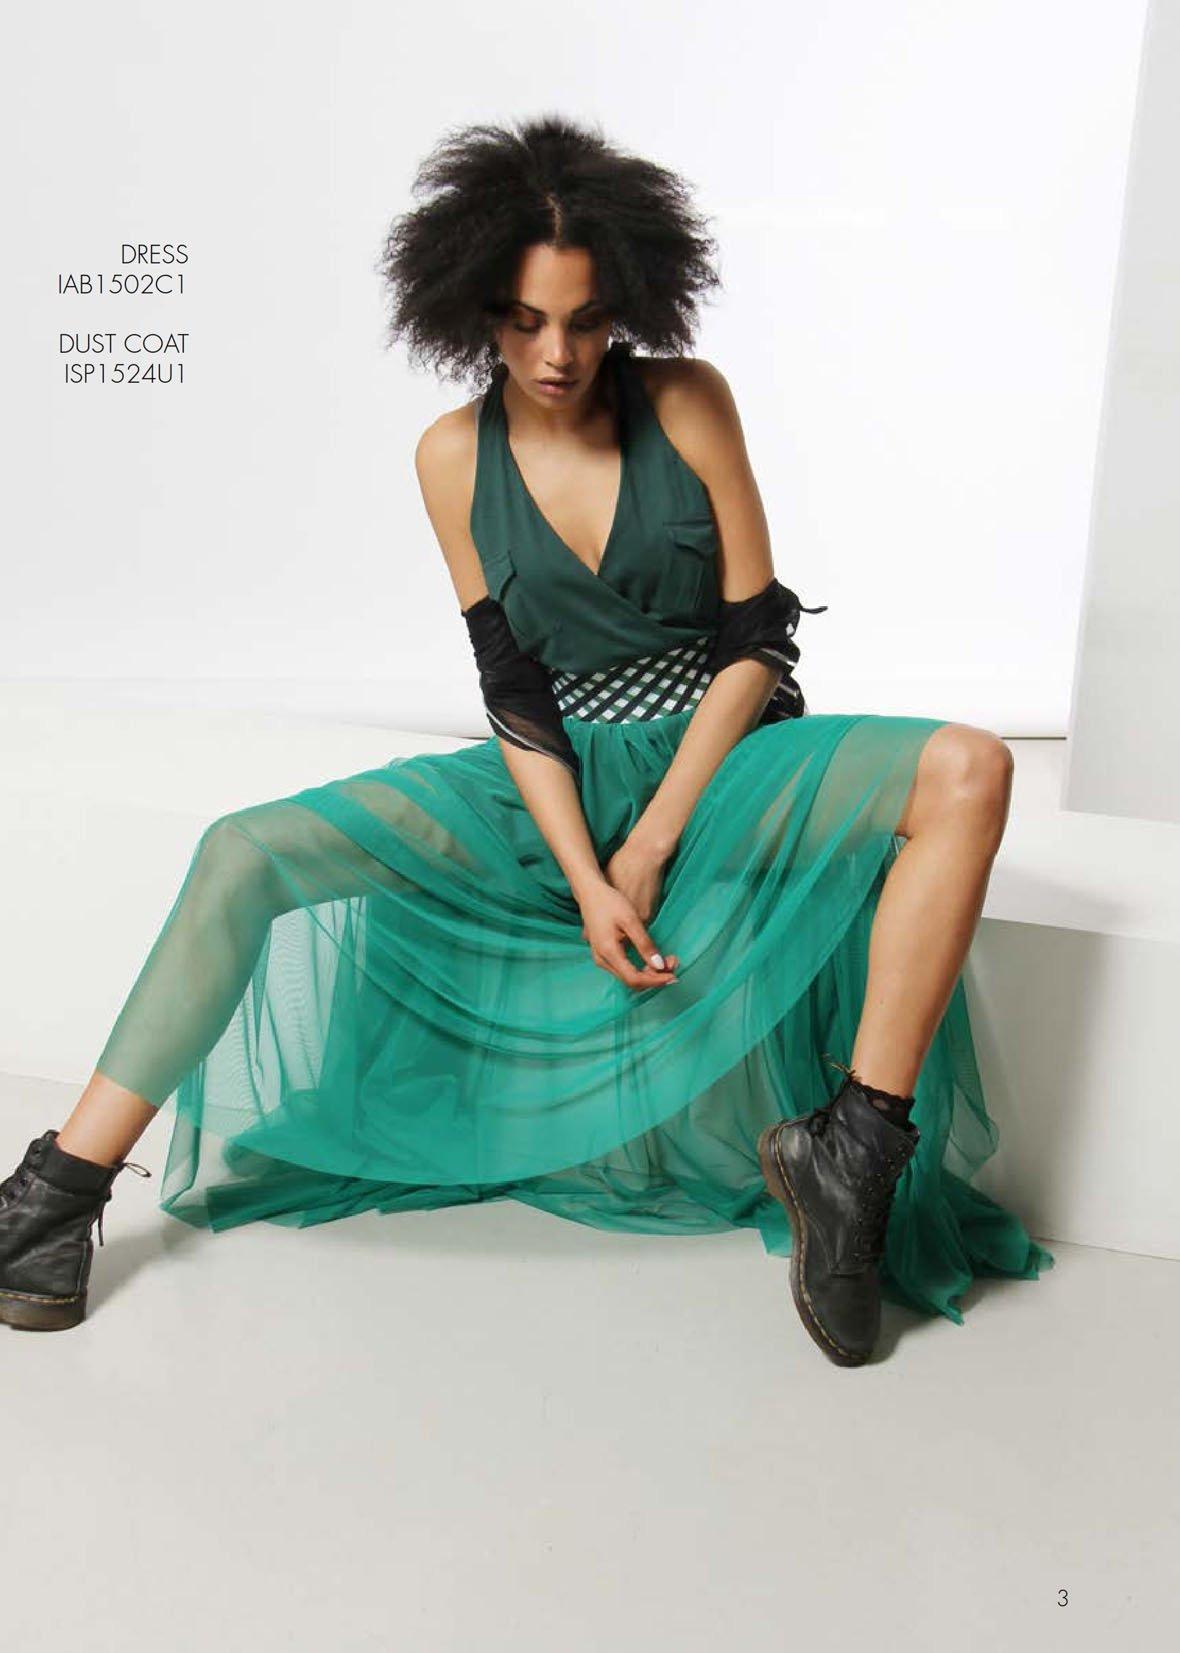 10 Wunderbar Elegantes Grünes Kleid Spezialgebiet Einfach Elegantes Grünes Kleid Design